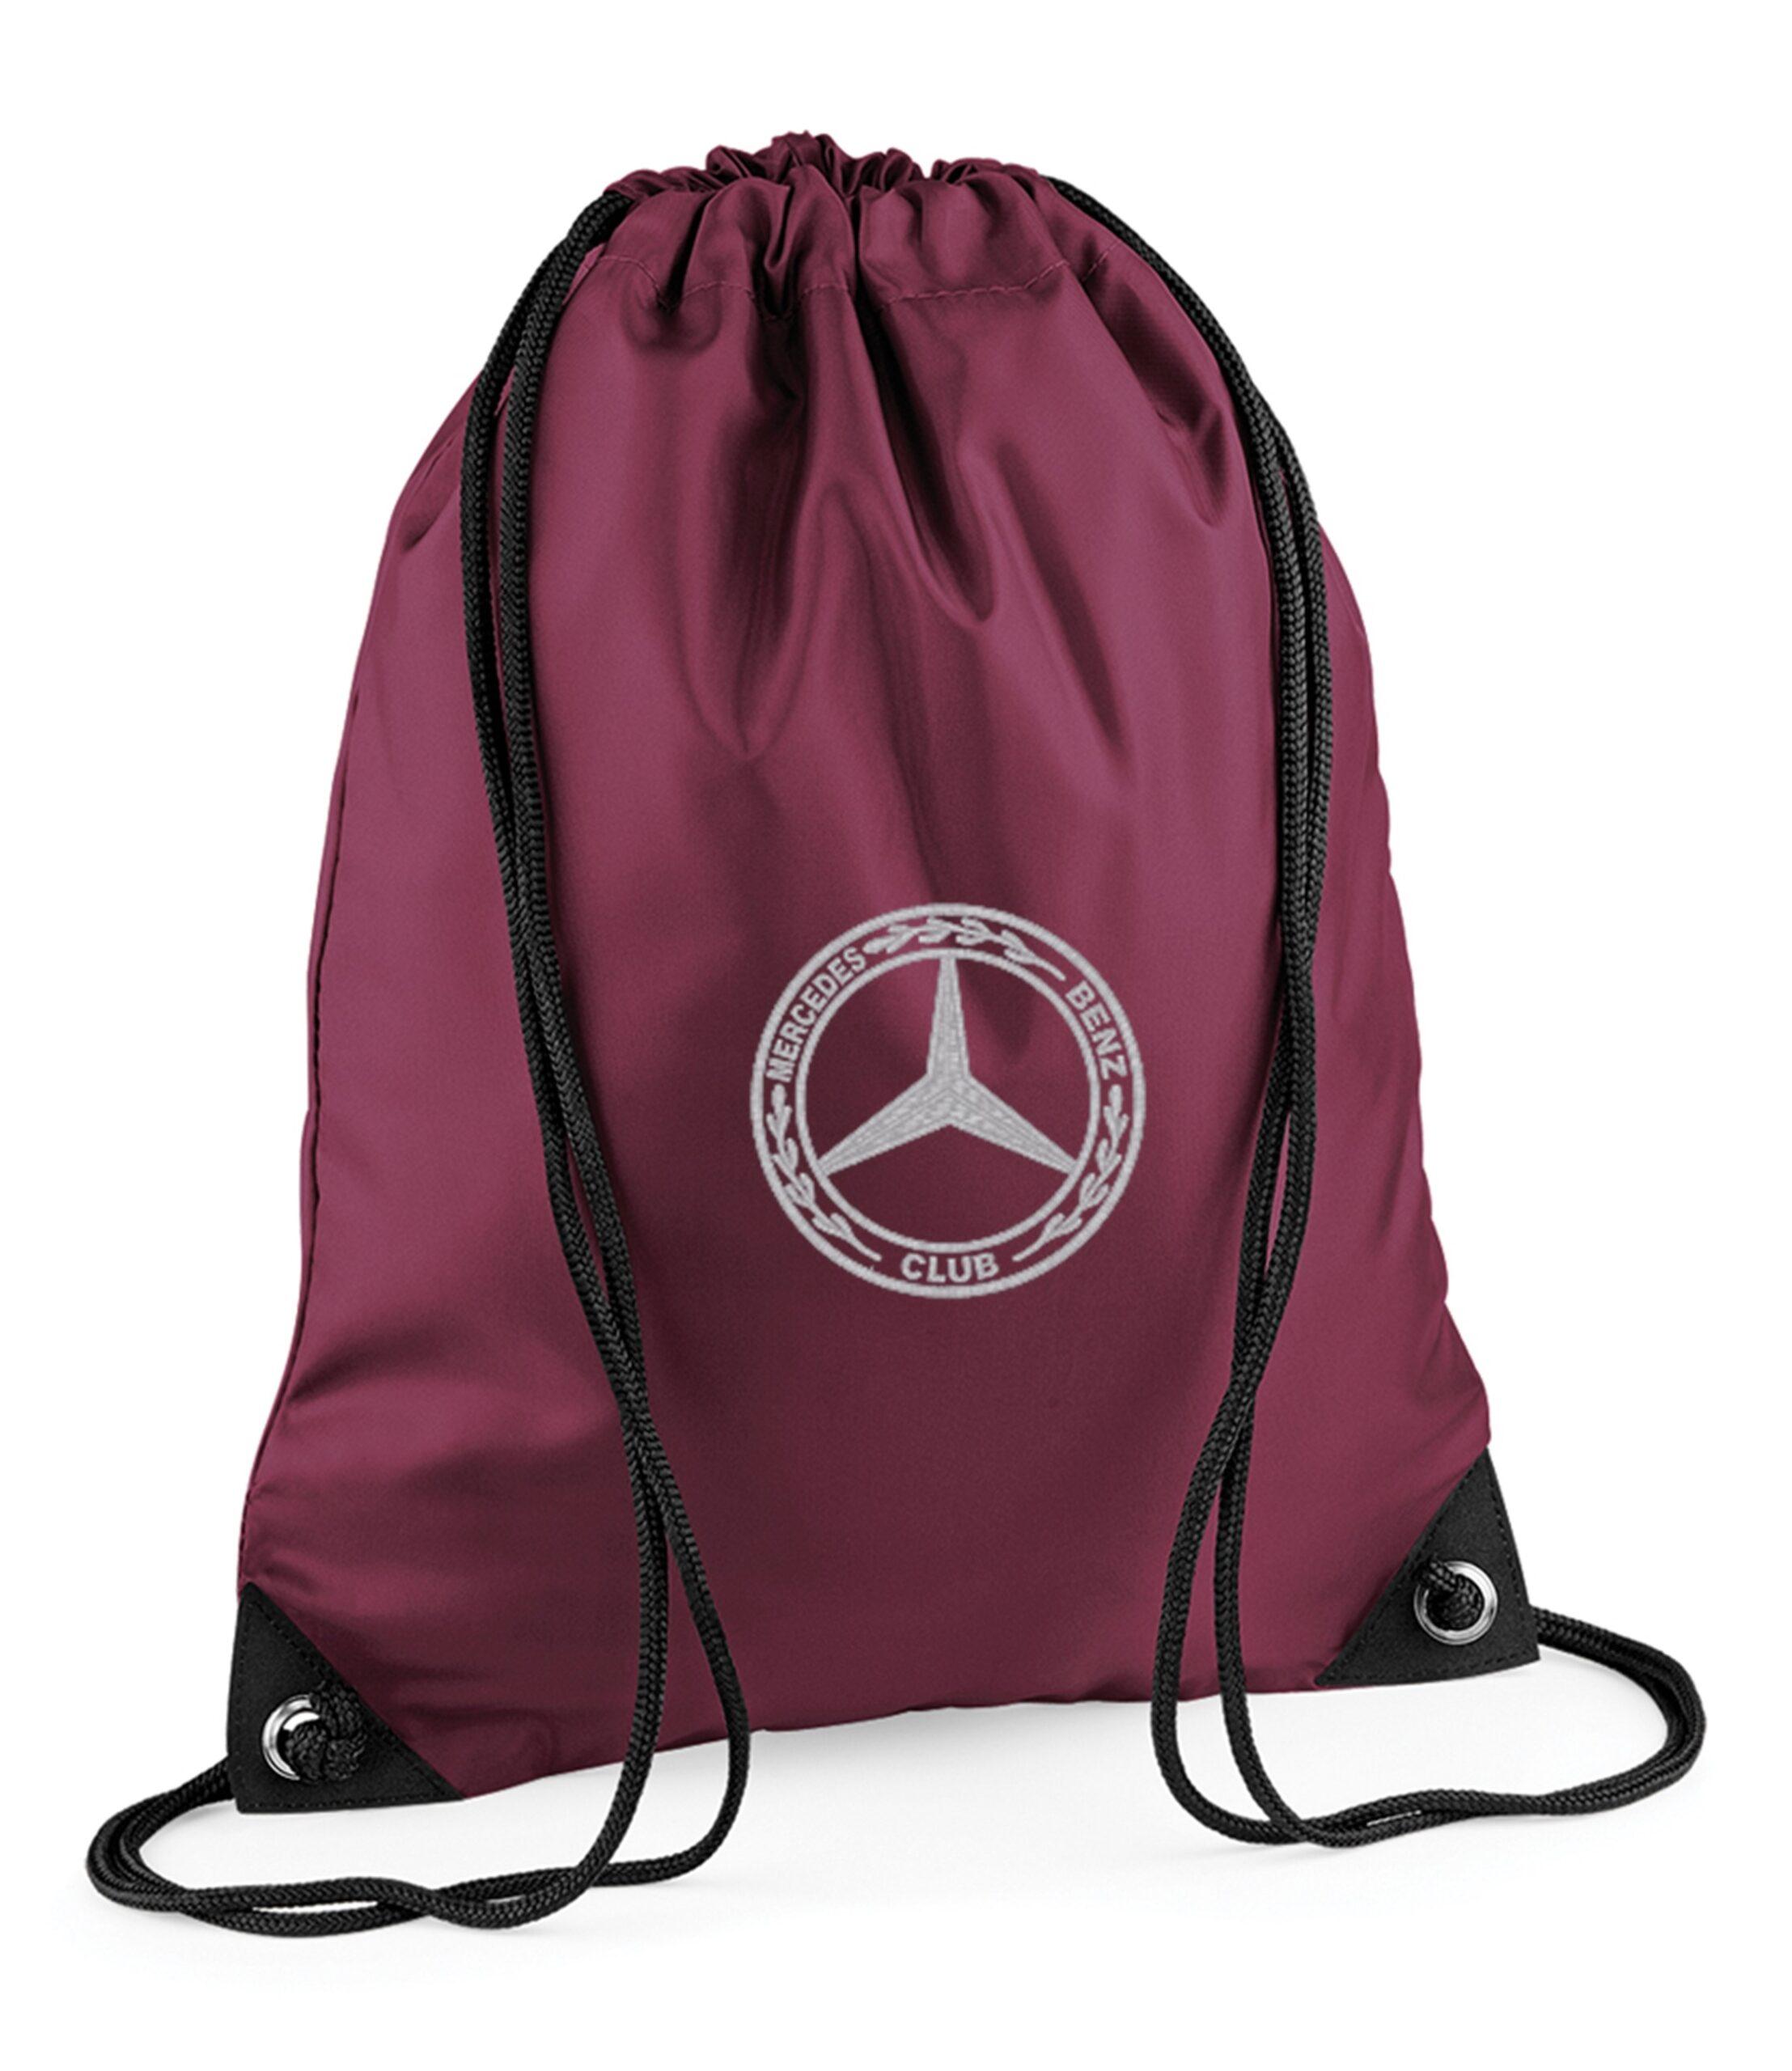 Mercedes Benz Gym Sac Burgundy